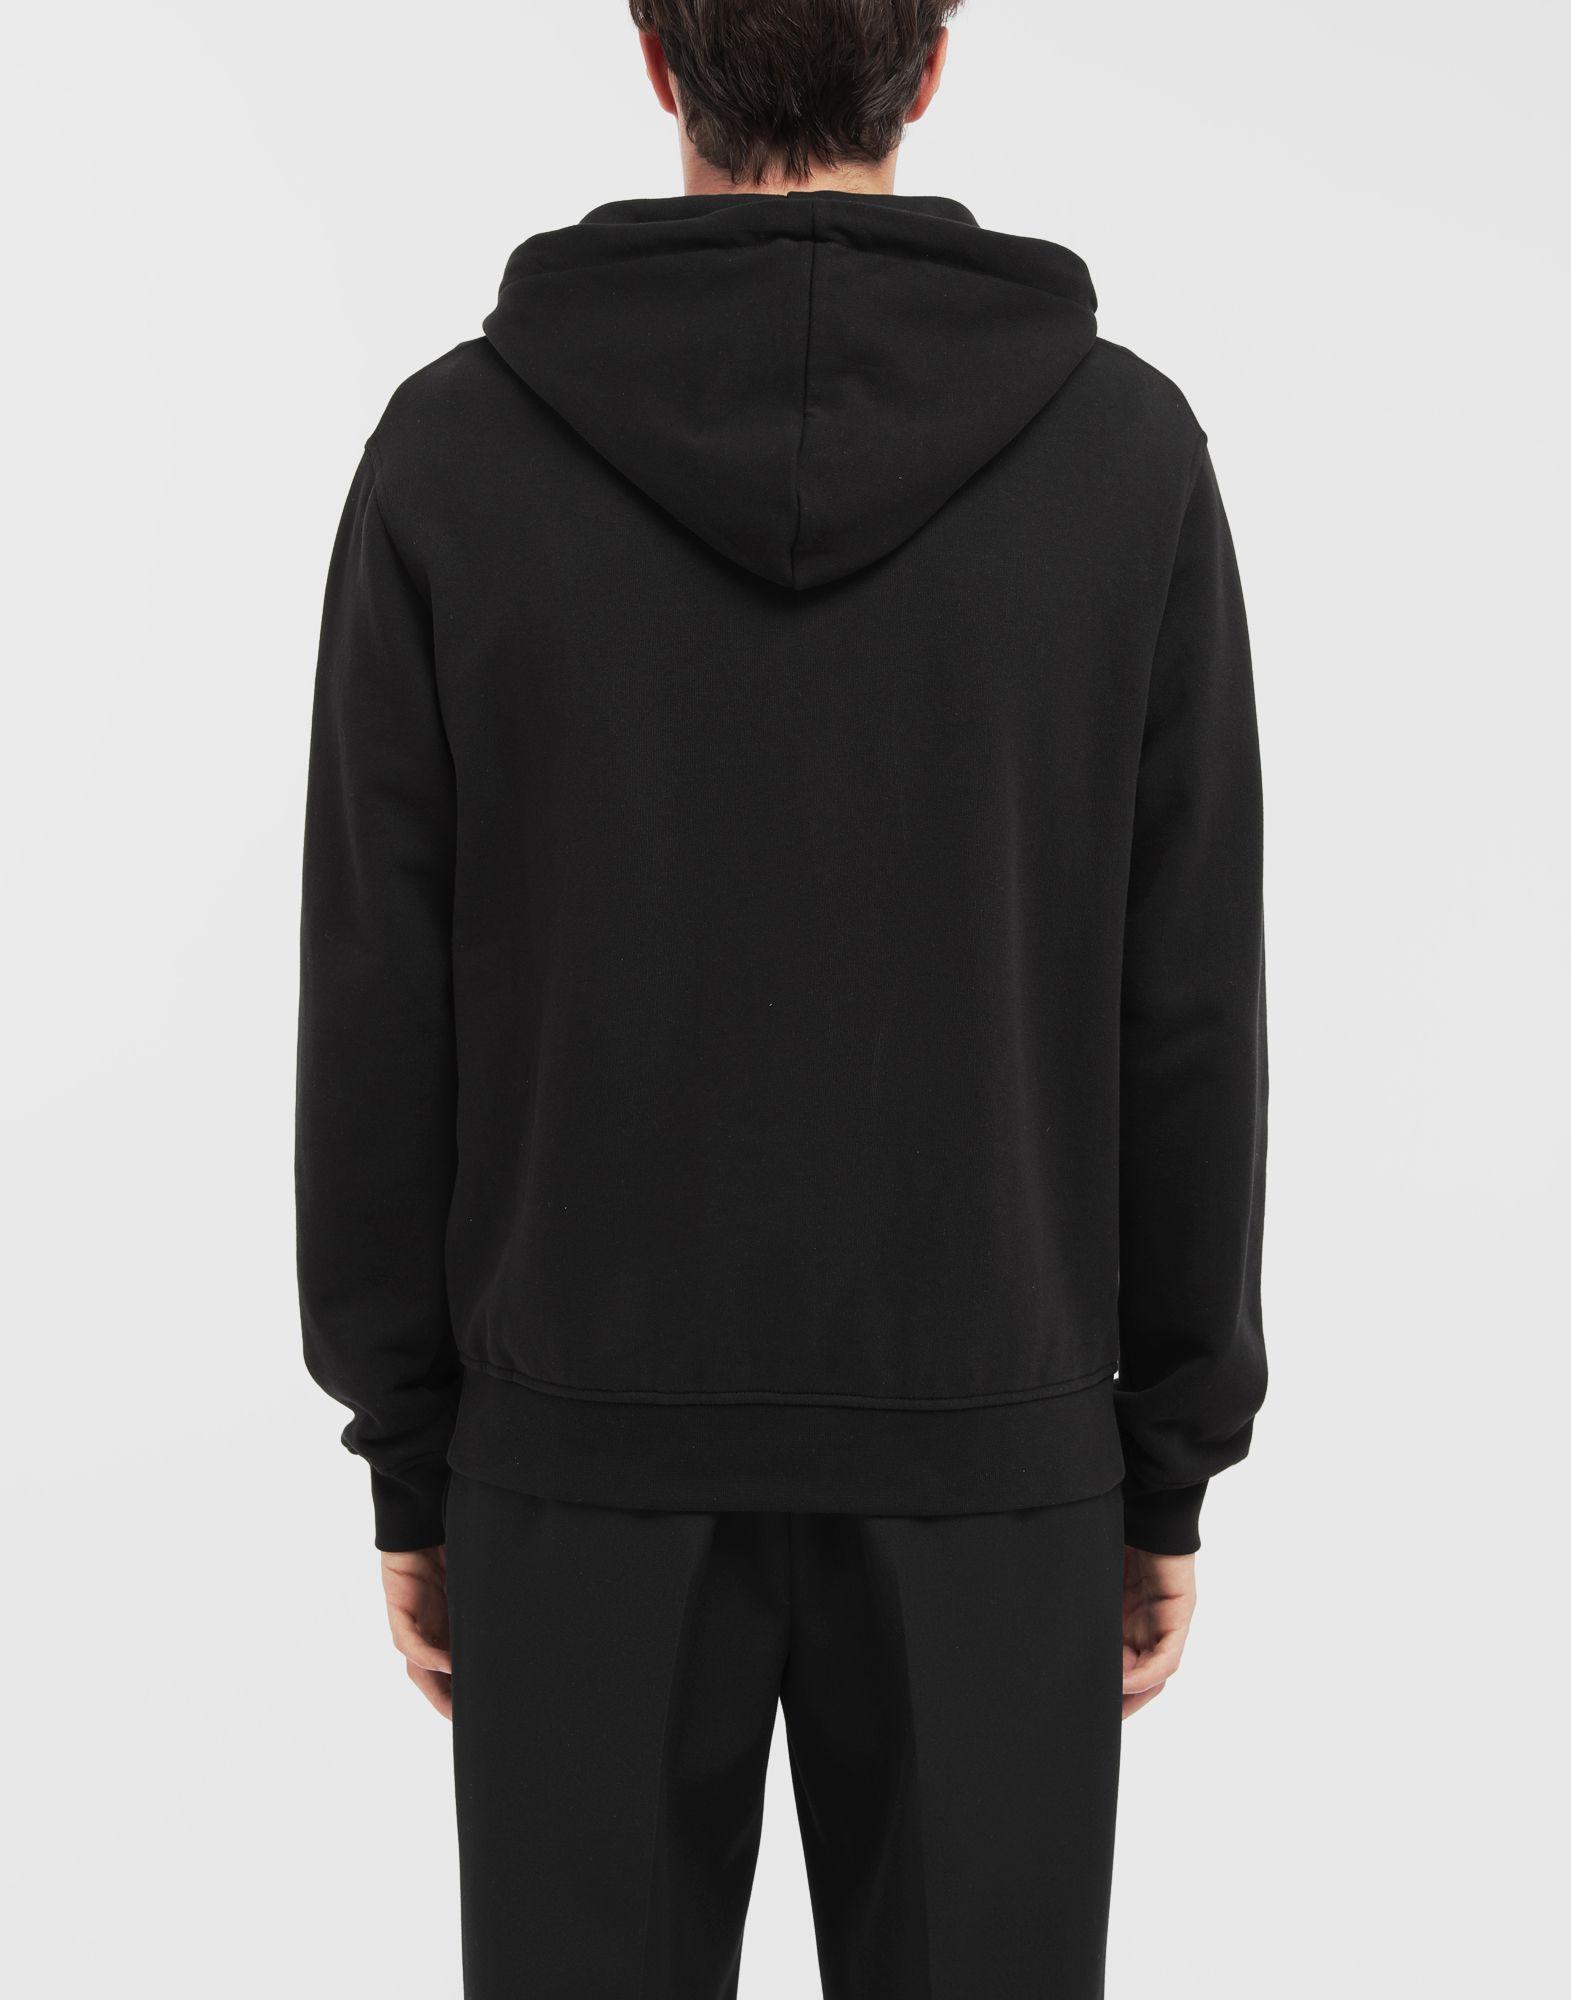 MAISON MARGIELA Stereotype hooded sweatshirt Sweatshirt Man e